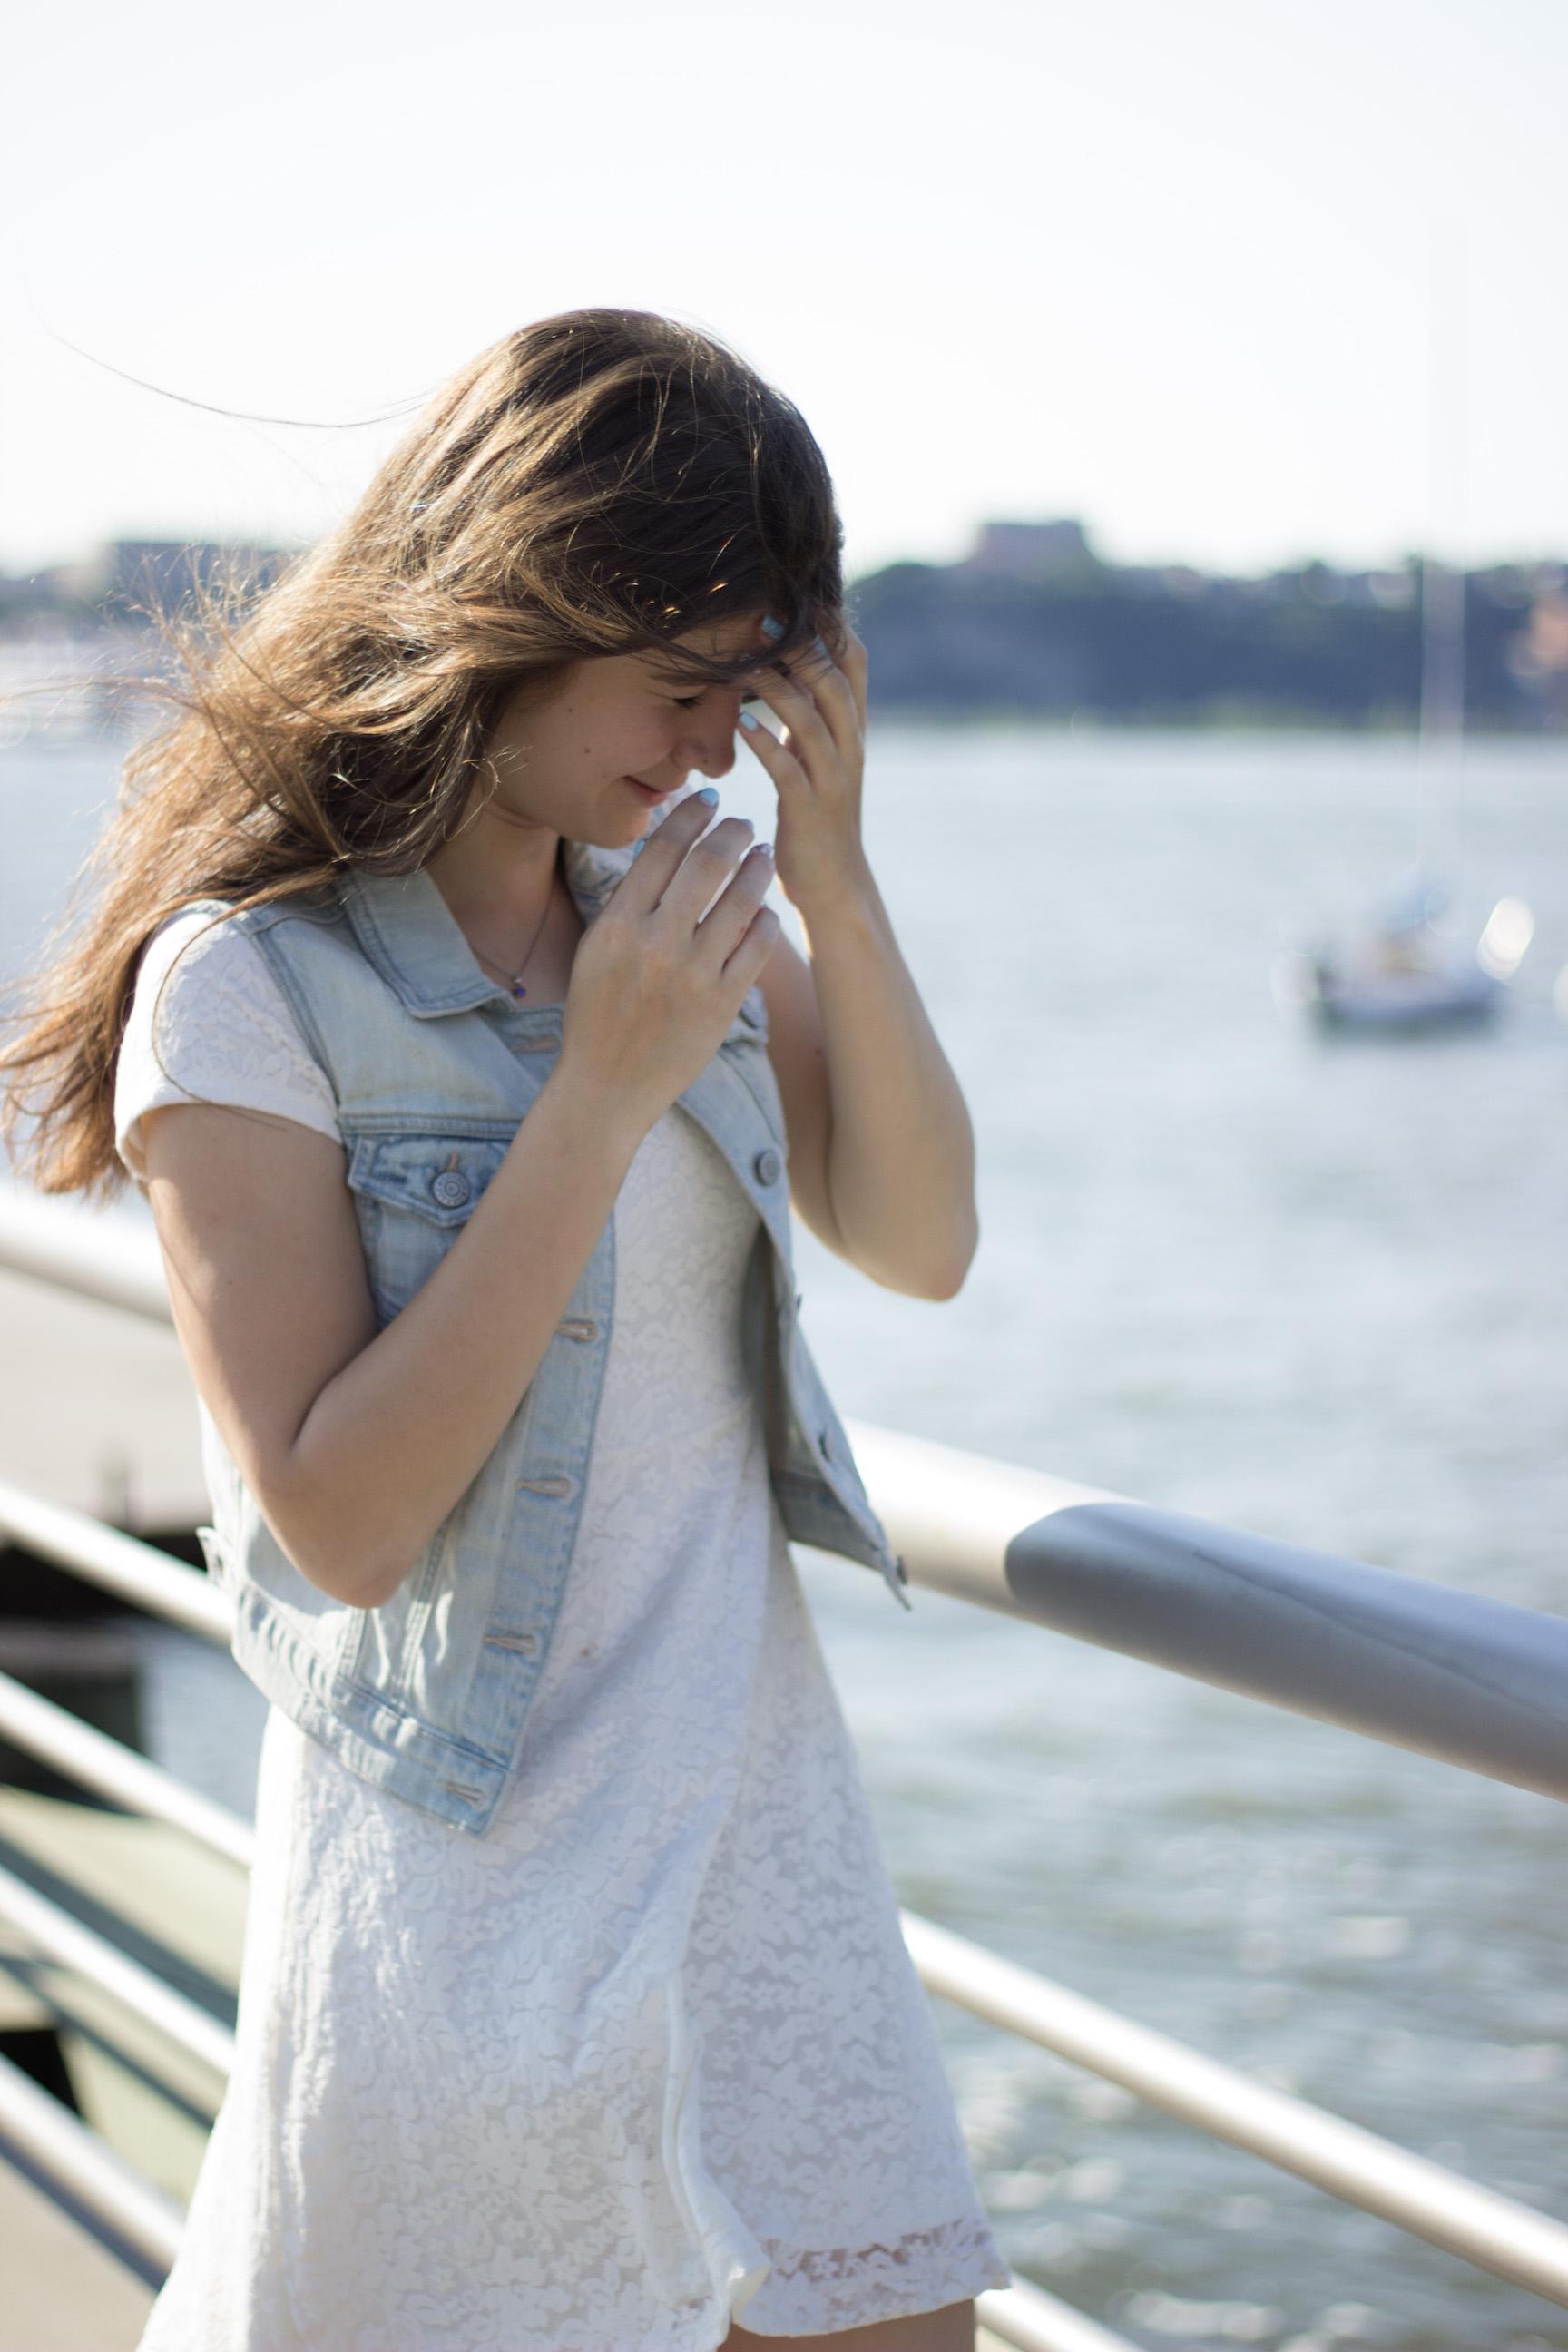 katya wind hudson denim white dress irra korrelat walksmilesnap new york senior photo.jpg